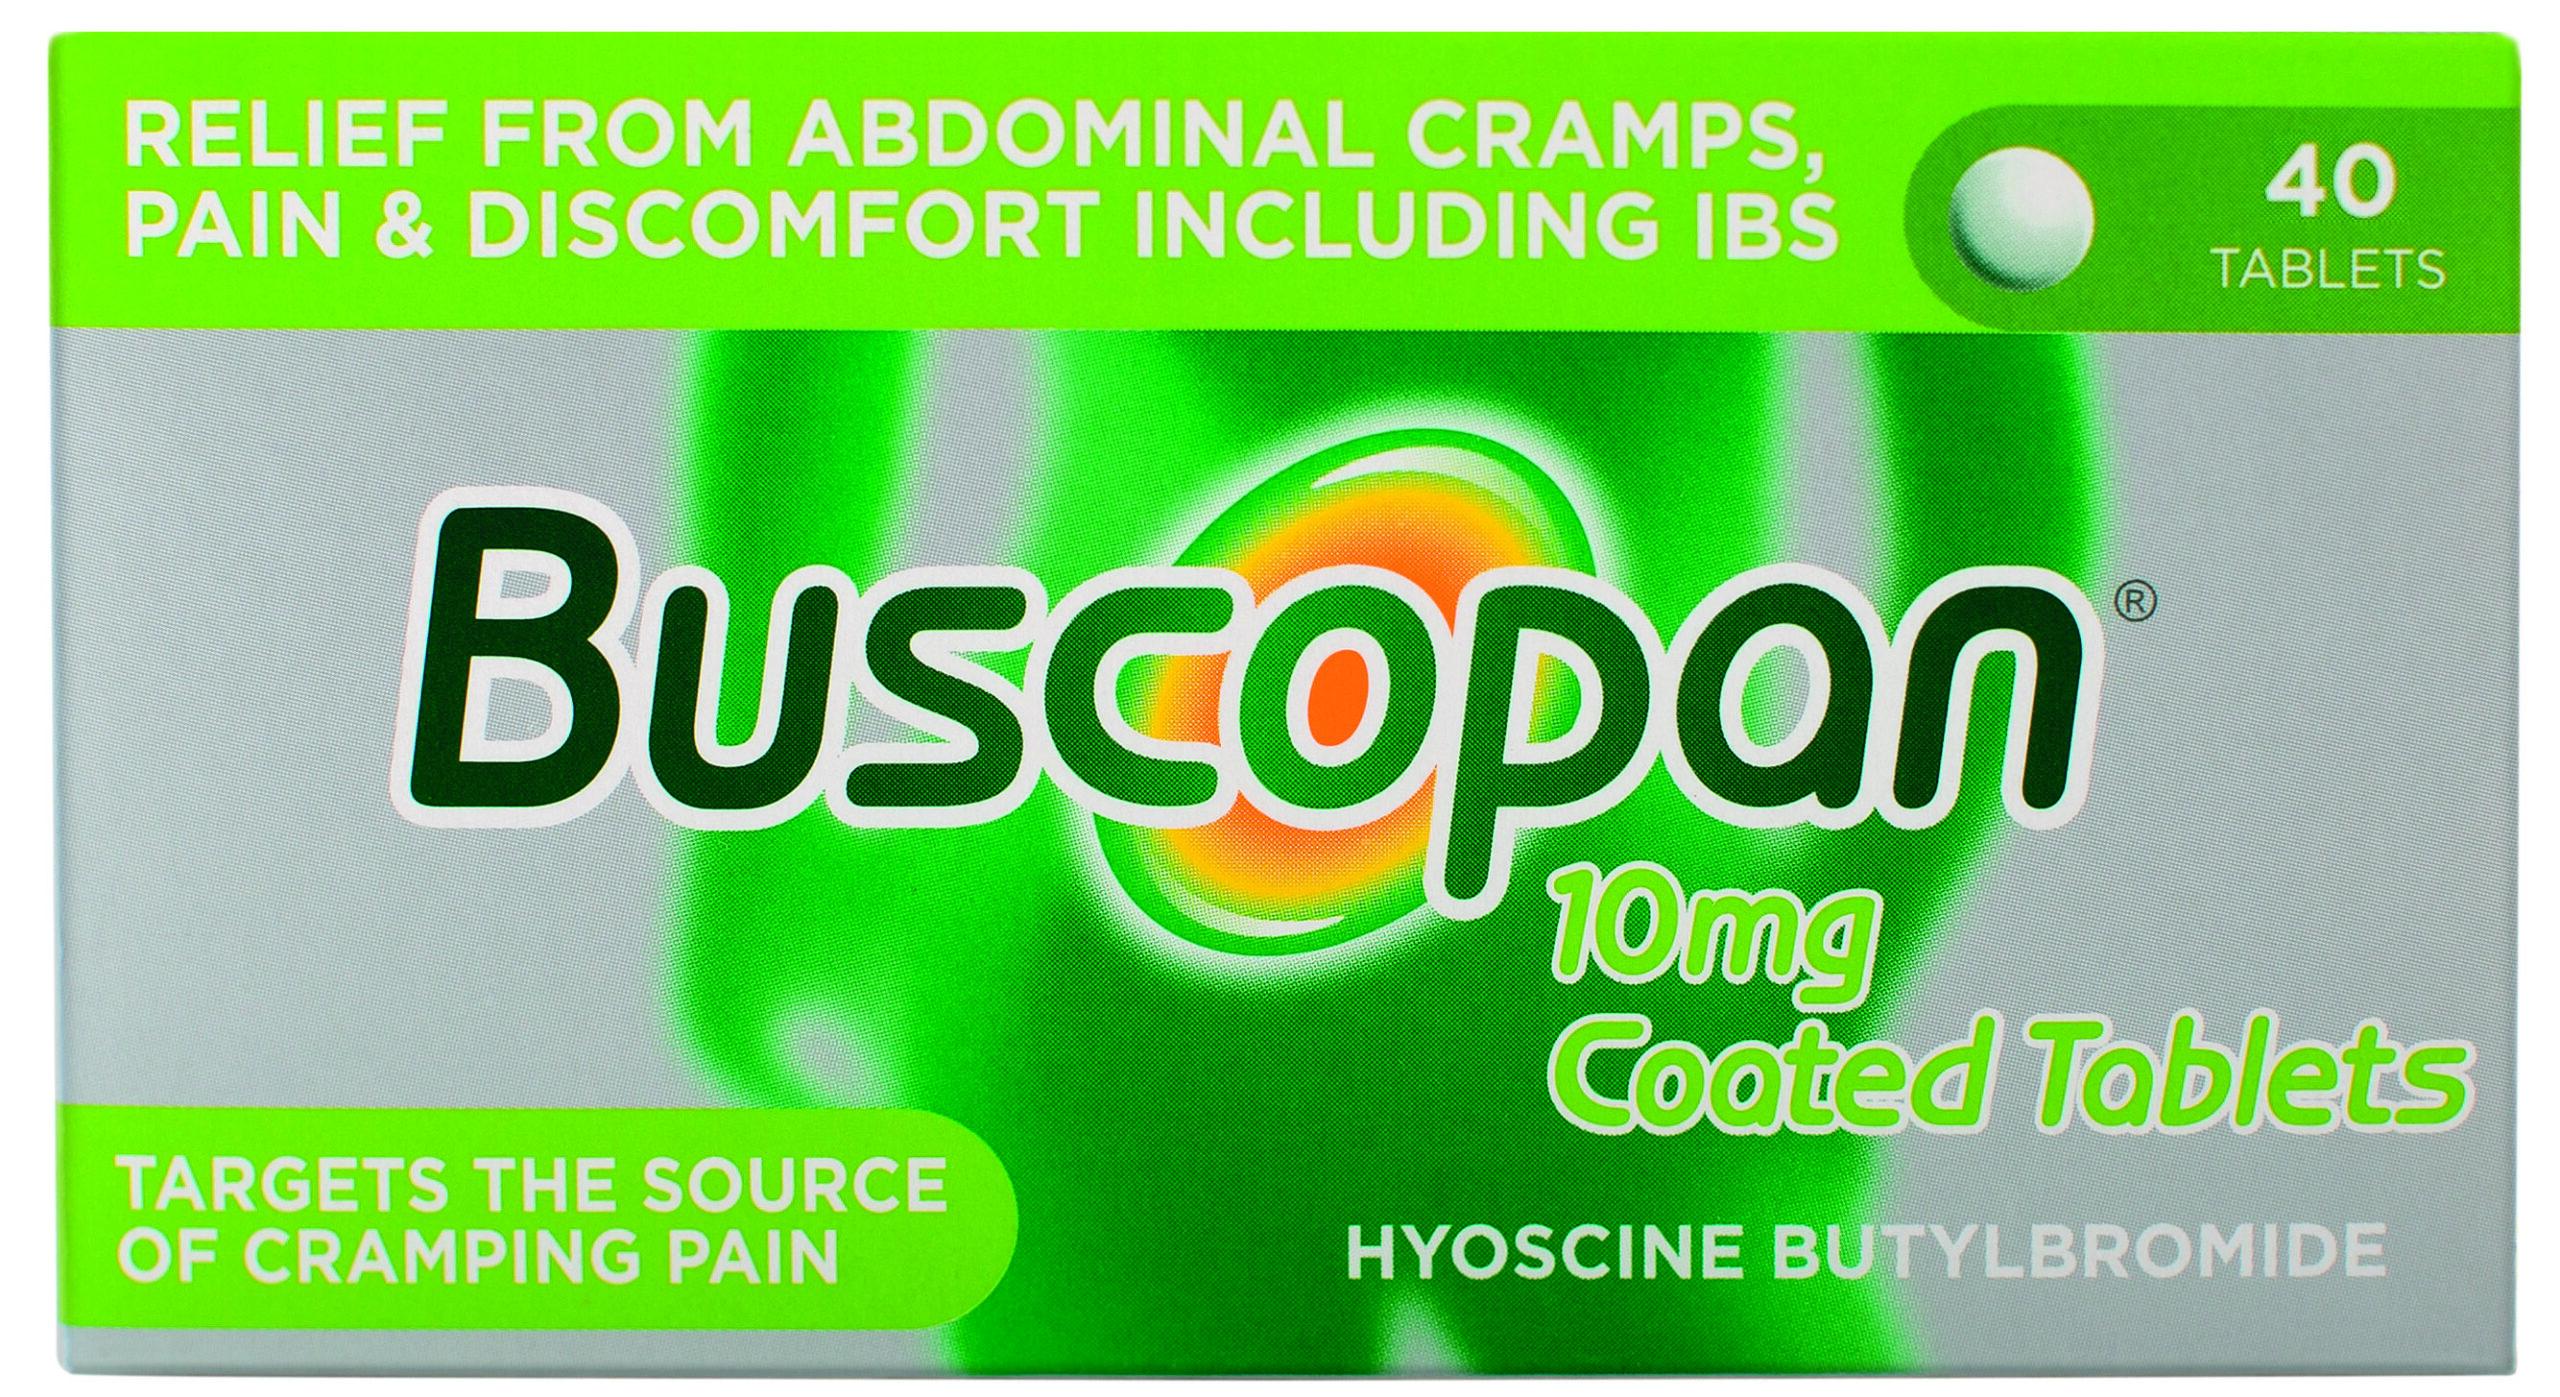 Buscopan 10 Mg Coated Tablets